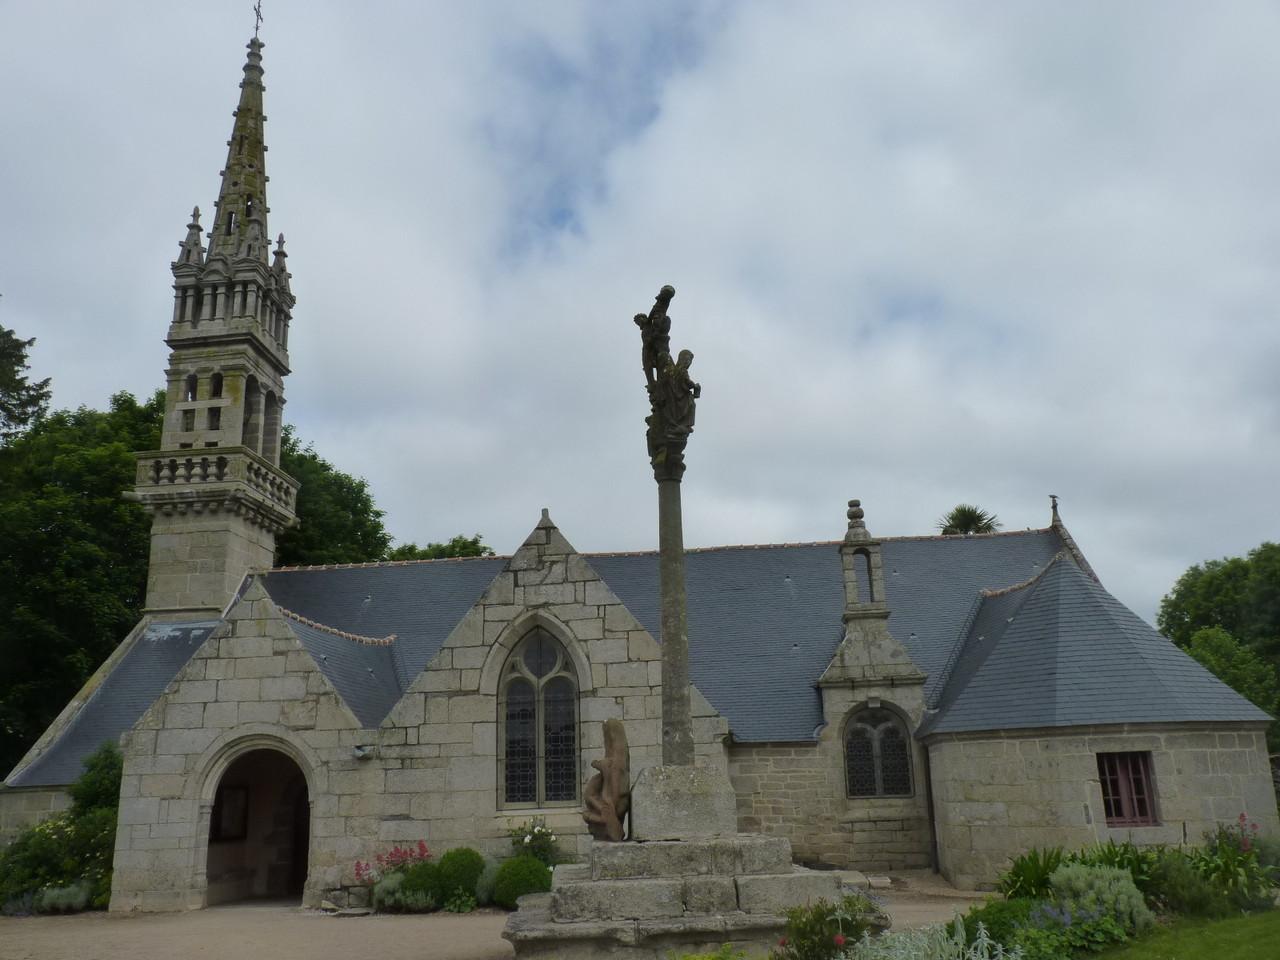 Eglise de Ploeven